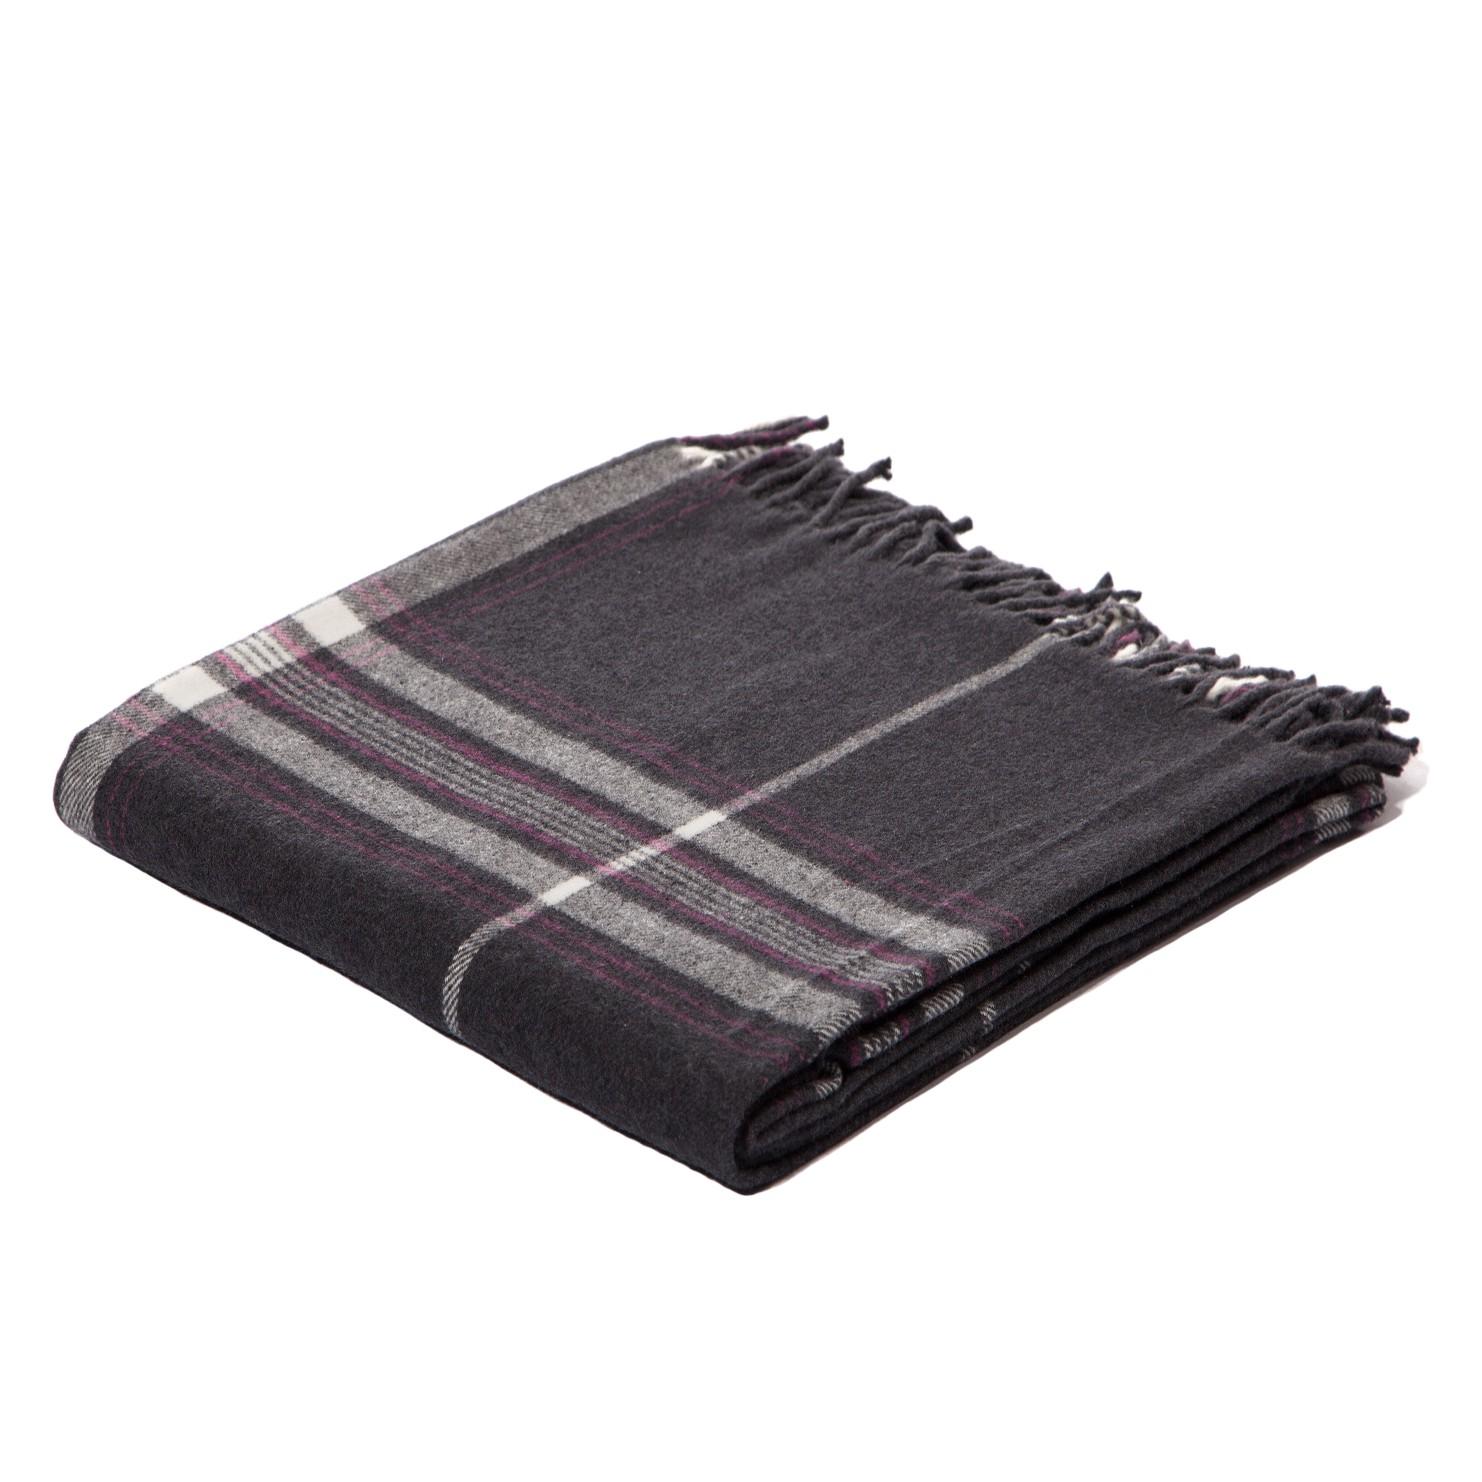 Ruhland Angebote Plaid Squares Plains - Webstoff Anthrazit / Grau